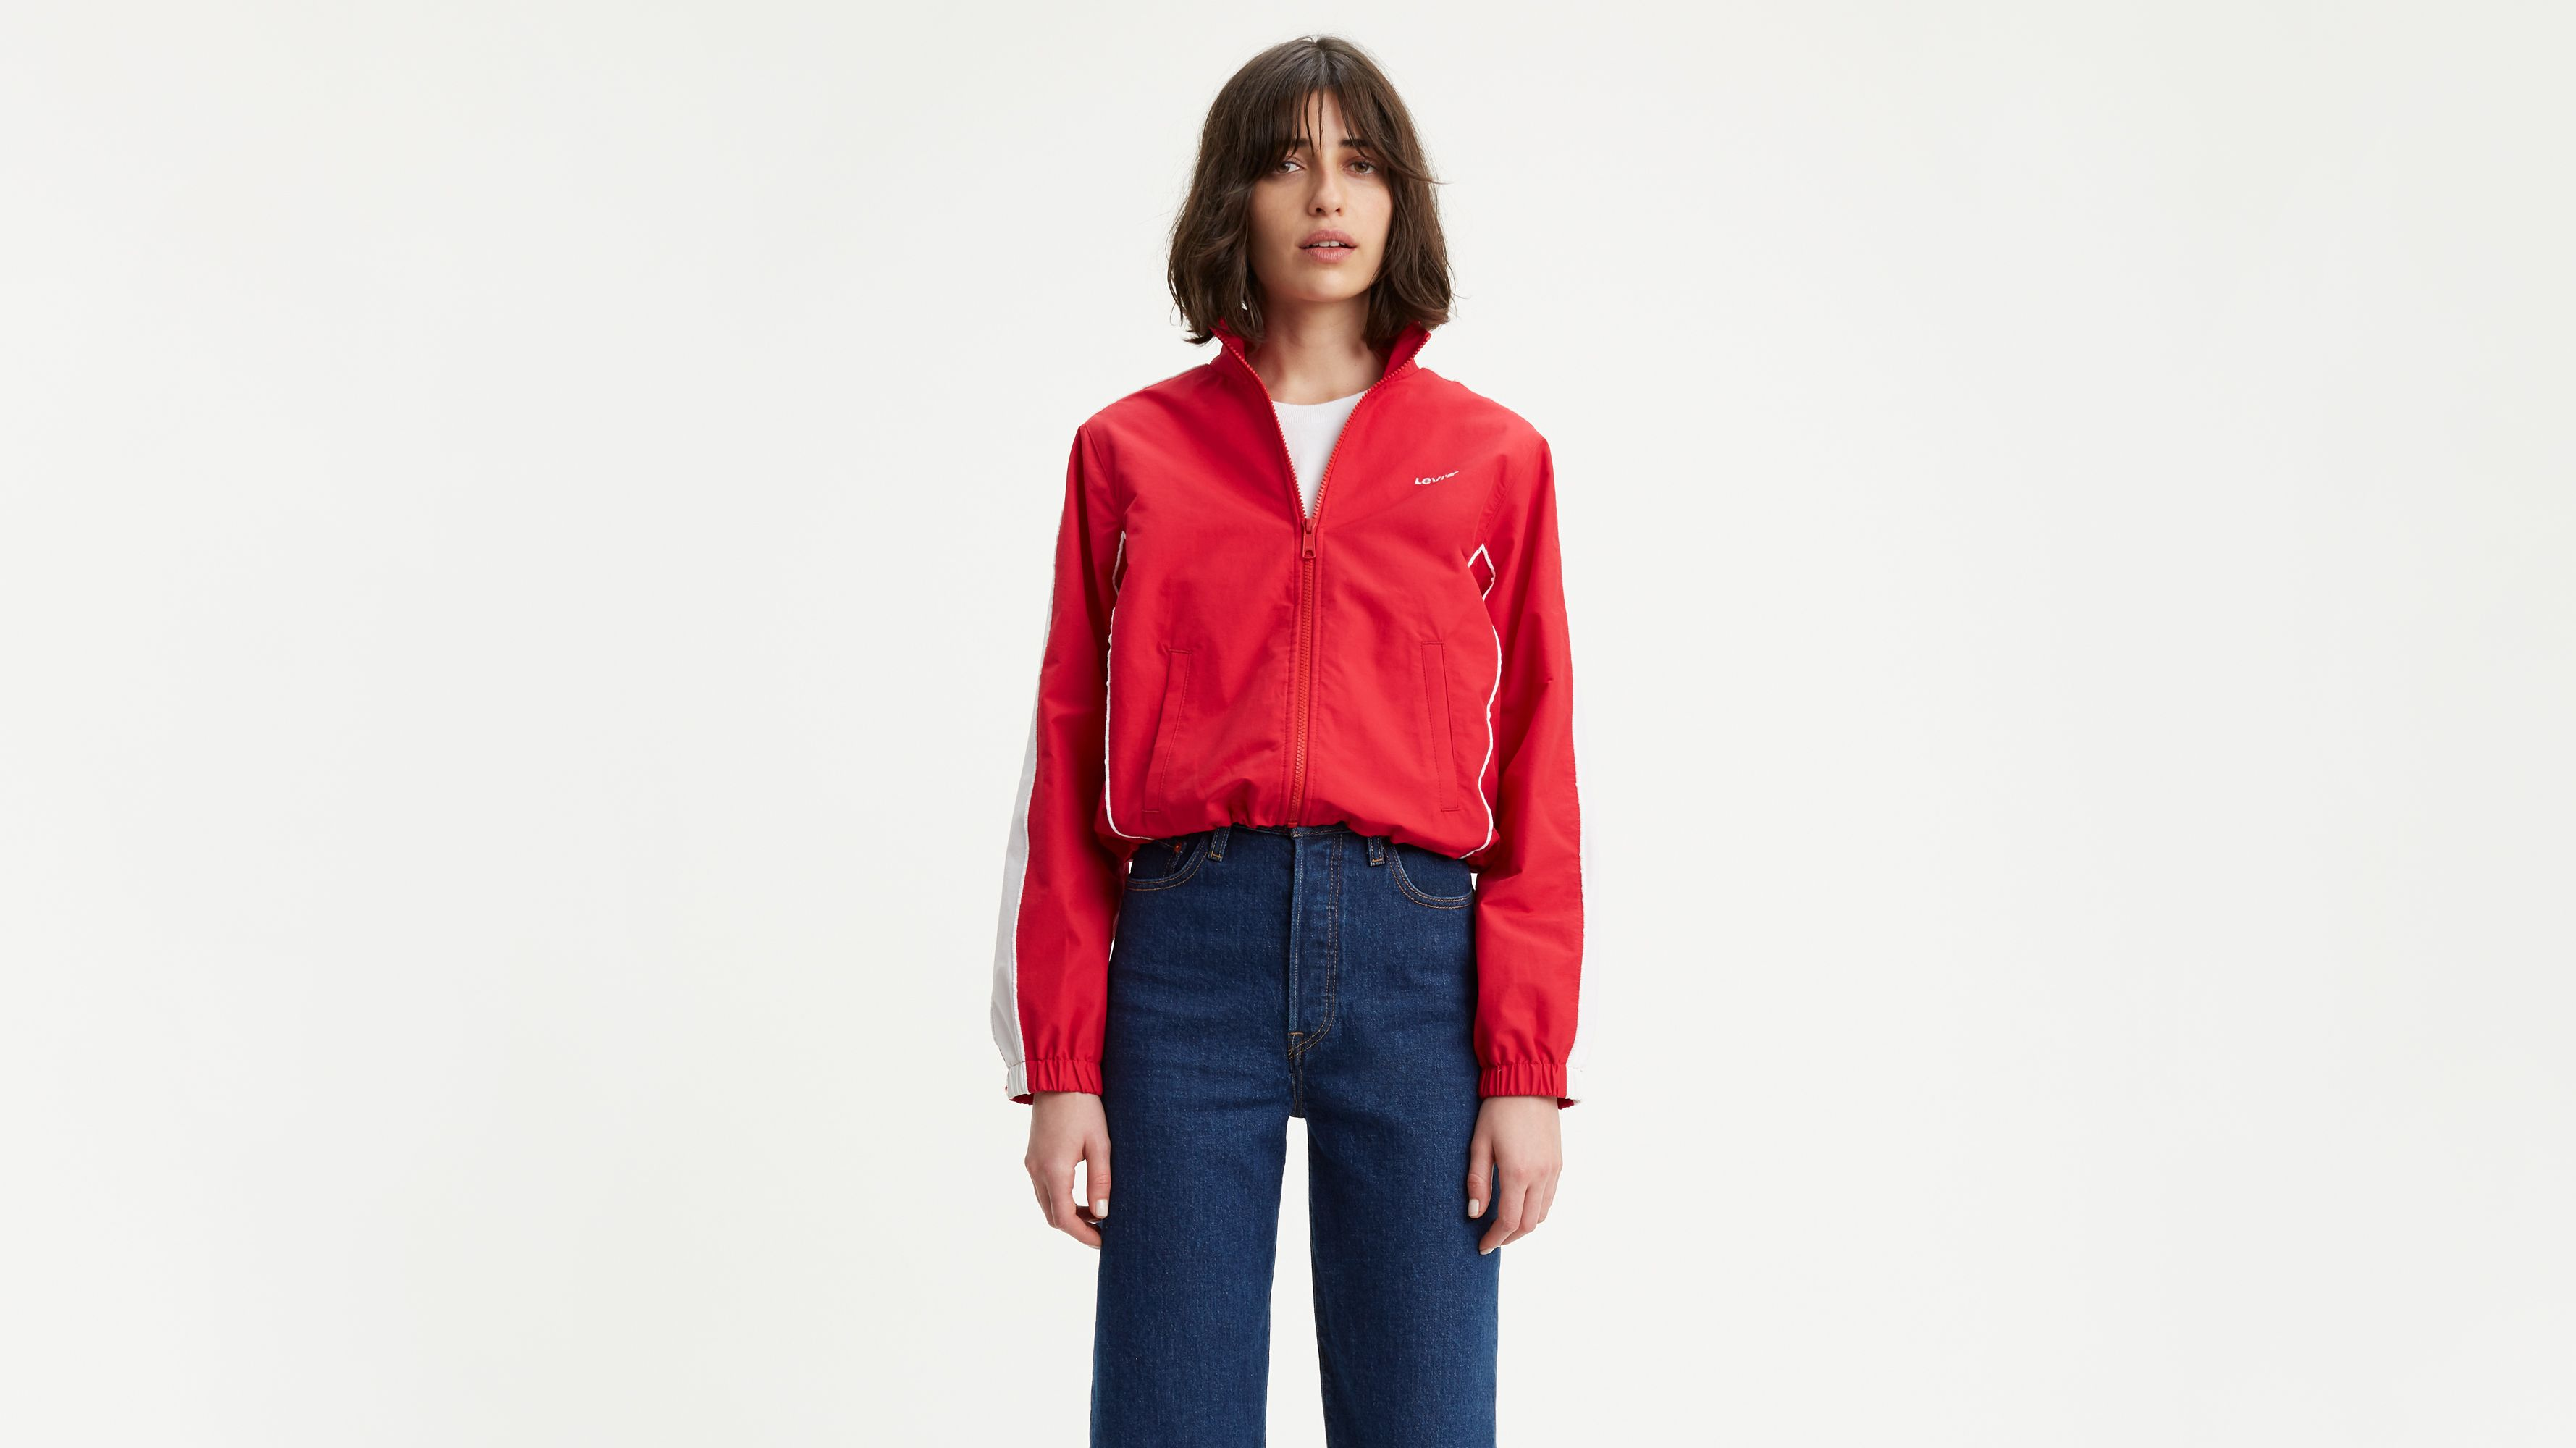 Levi's Women's amp; Coats Jackets Women's Coats nXPzgnxO